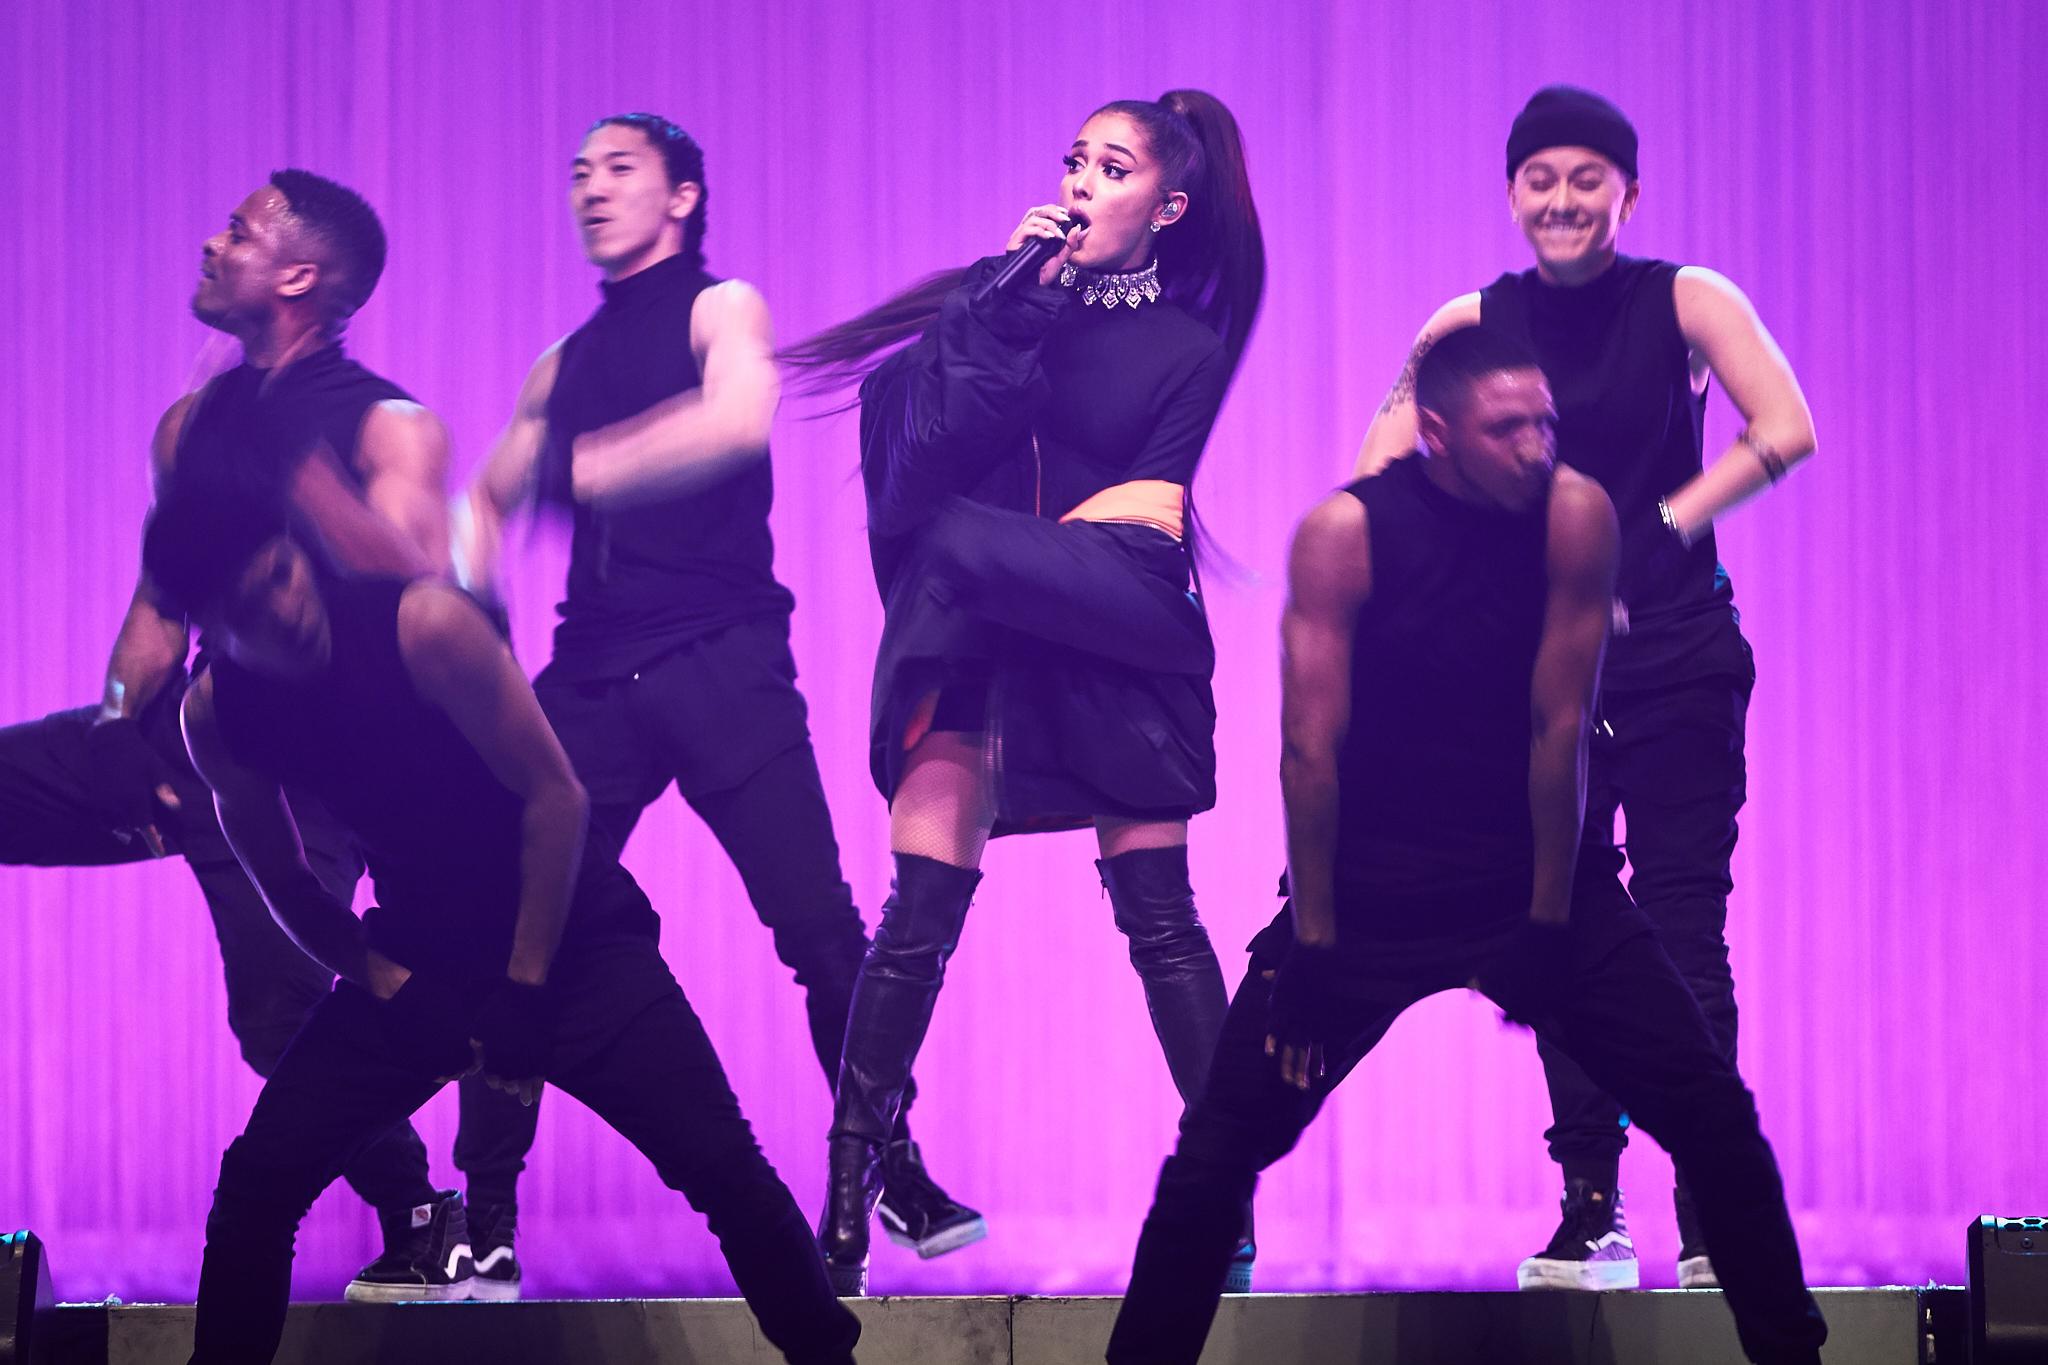 Ariana_Grande_At_Xcel_Energy_Center_03-16-2017_Photo_By_Joe_Lemke_014.jpg